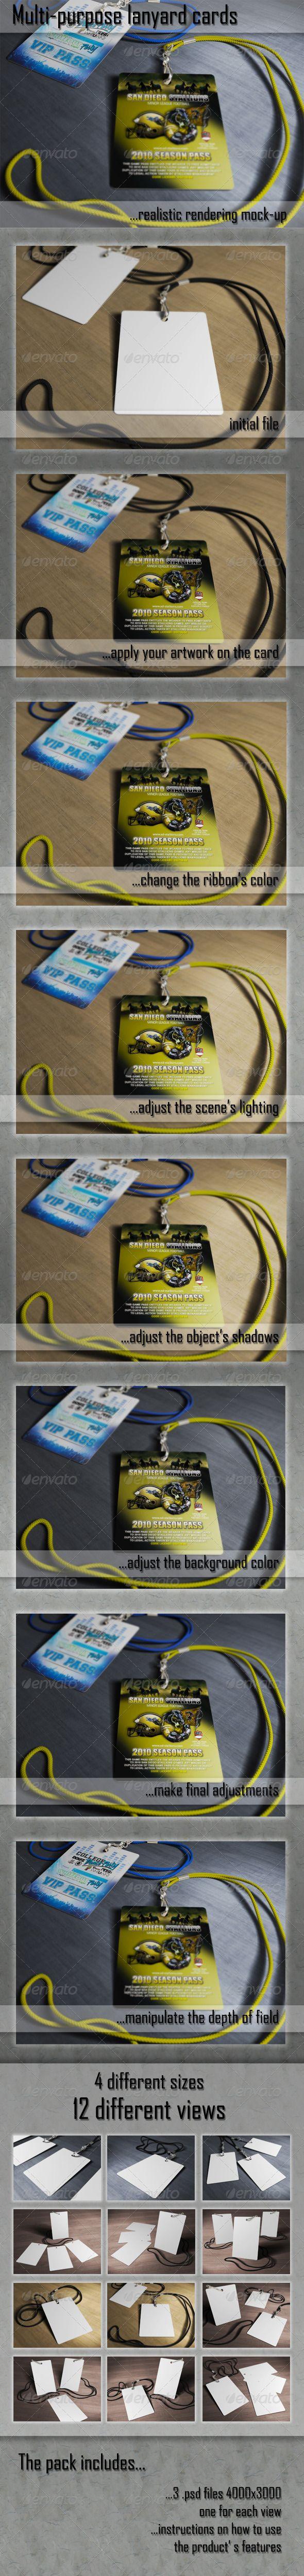 Multipurpose Hanging Card Mockups Download here: https://graphicriver.net/item/multipurpose-hanging-card-mockups/4495809?ref=KlitVogli